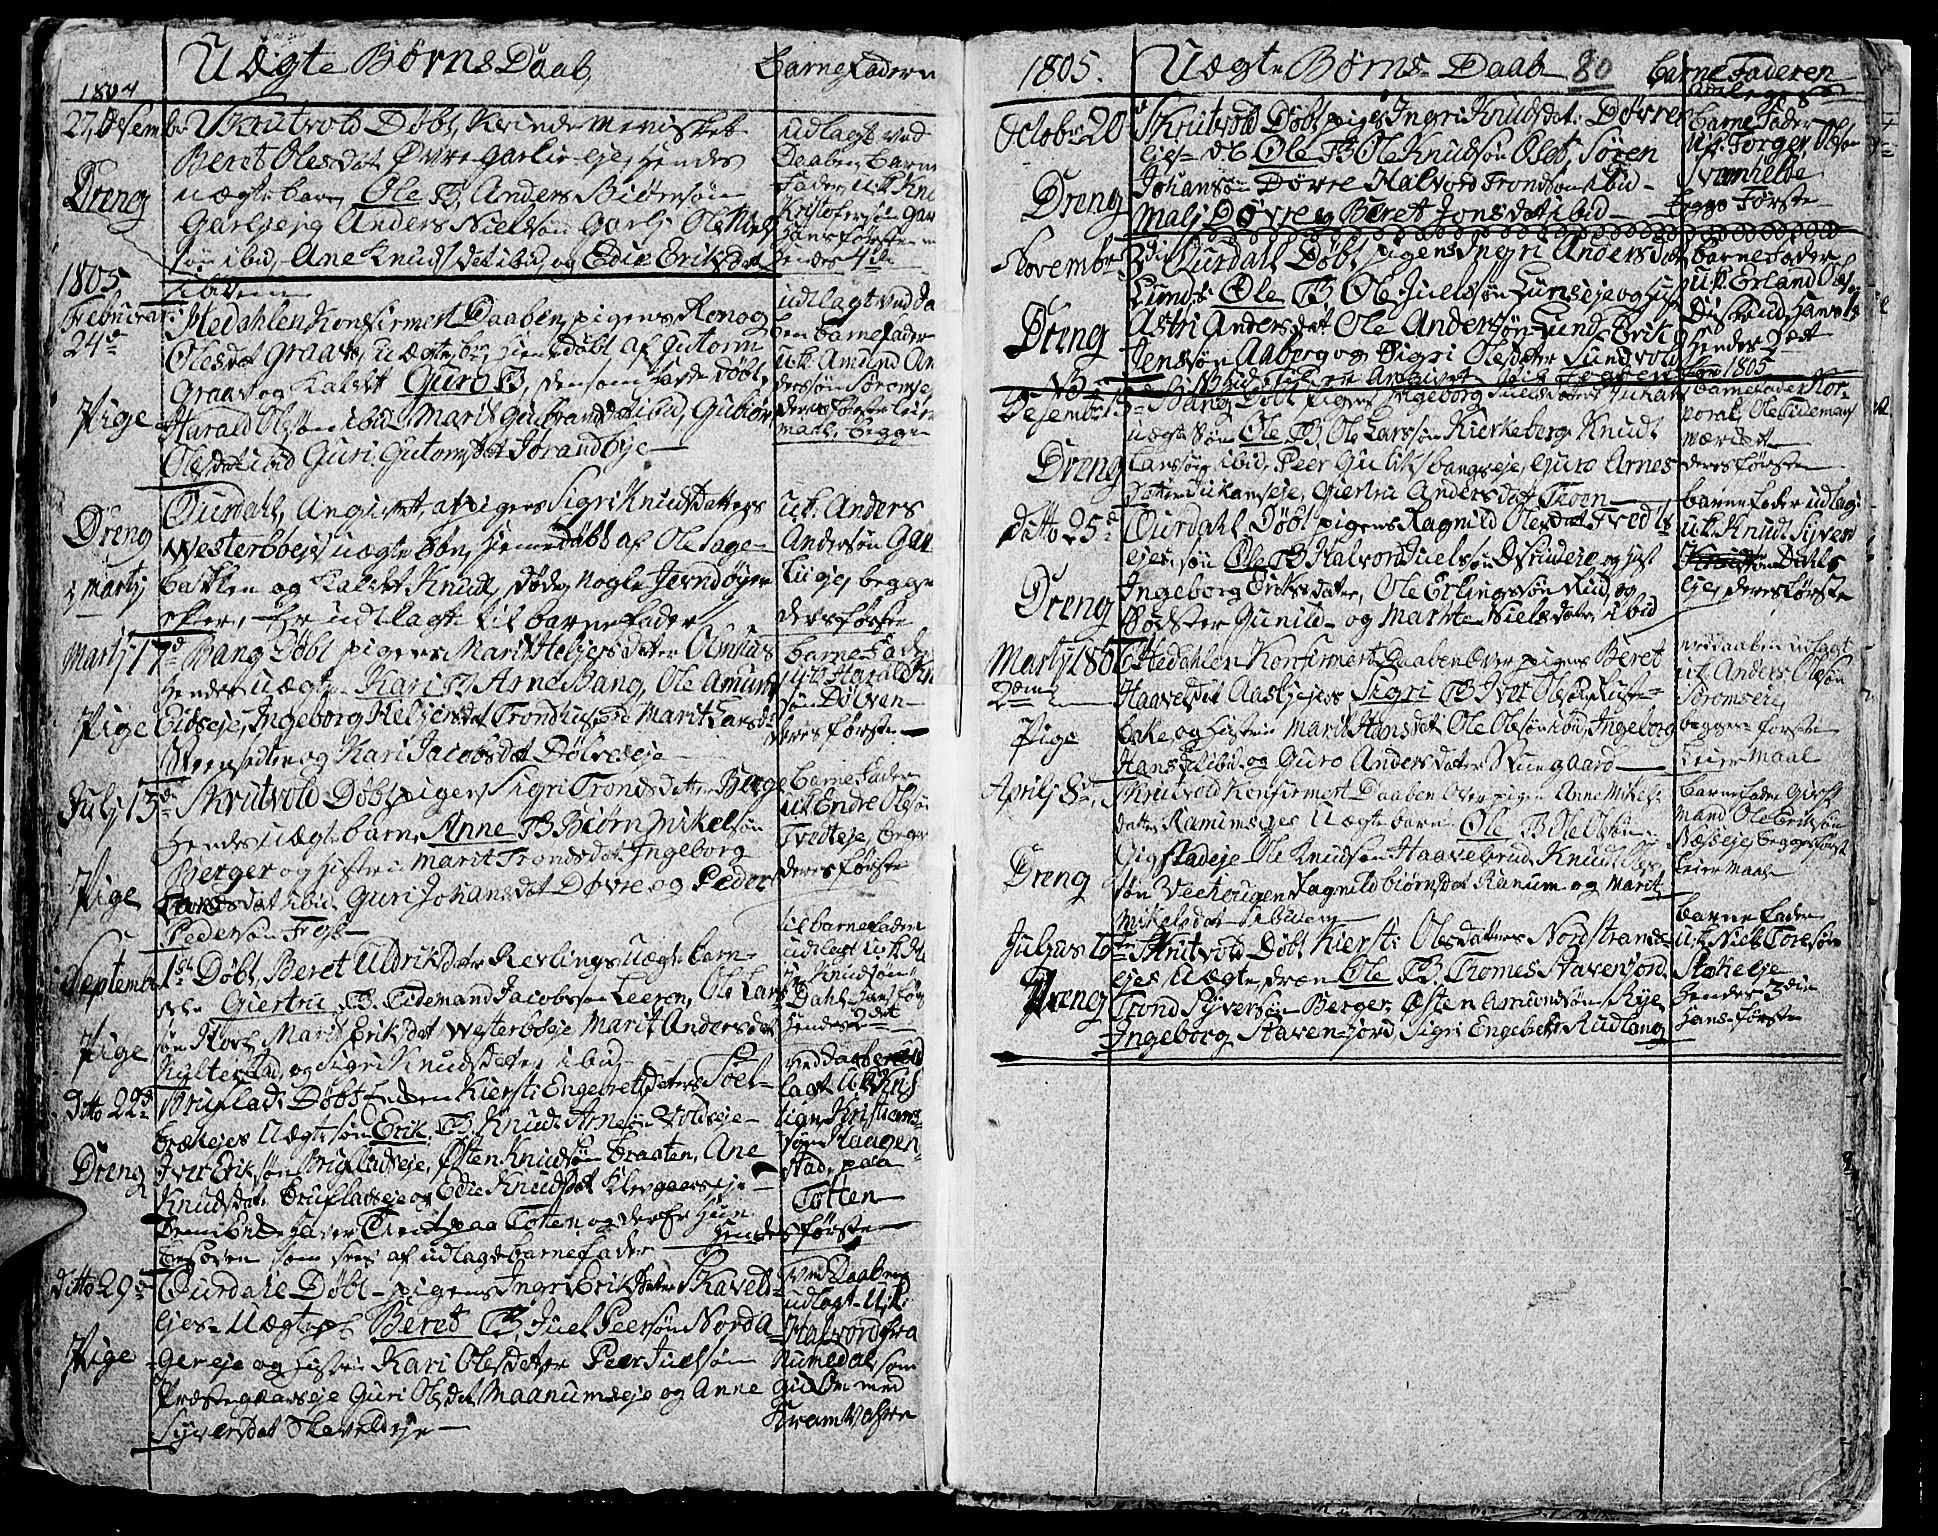 SAH, Aurdal prestekontor, Ministerialbok nr. 7, 1800-1808, s. 80